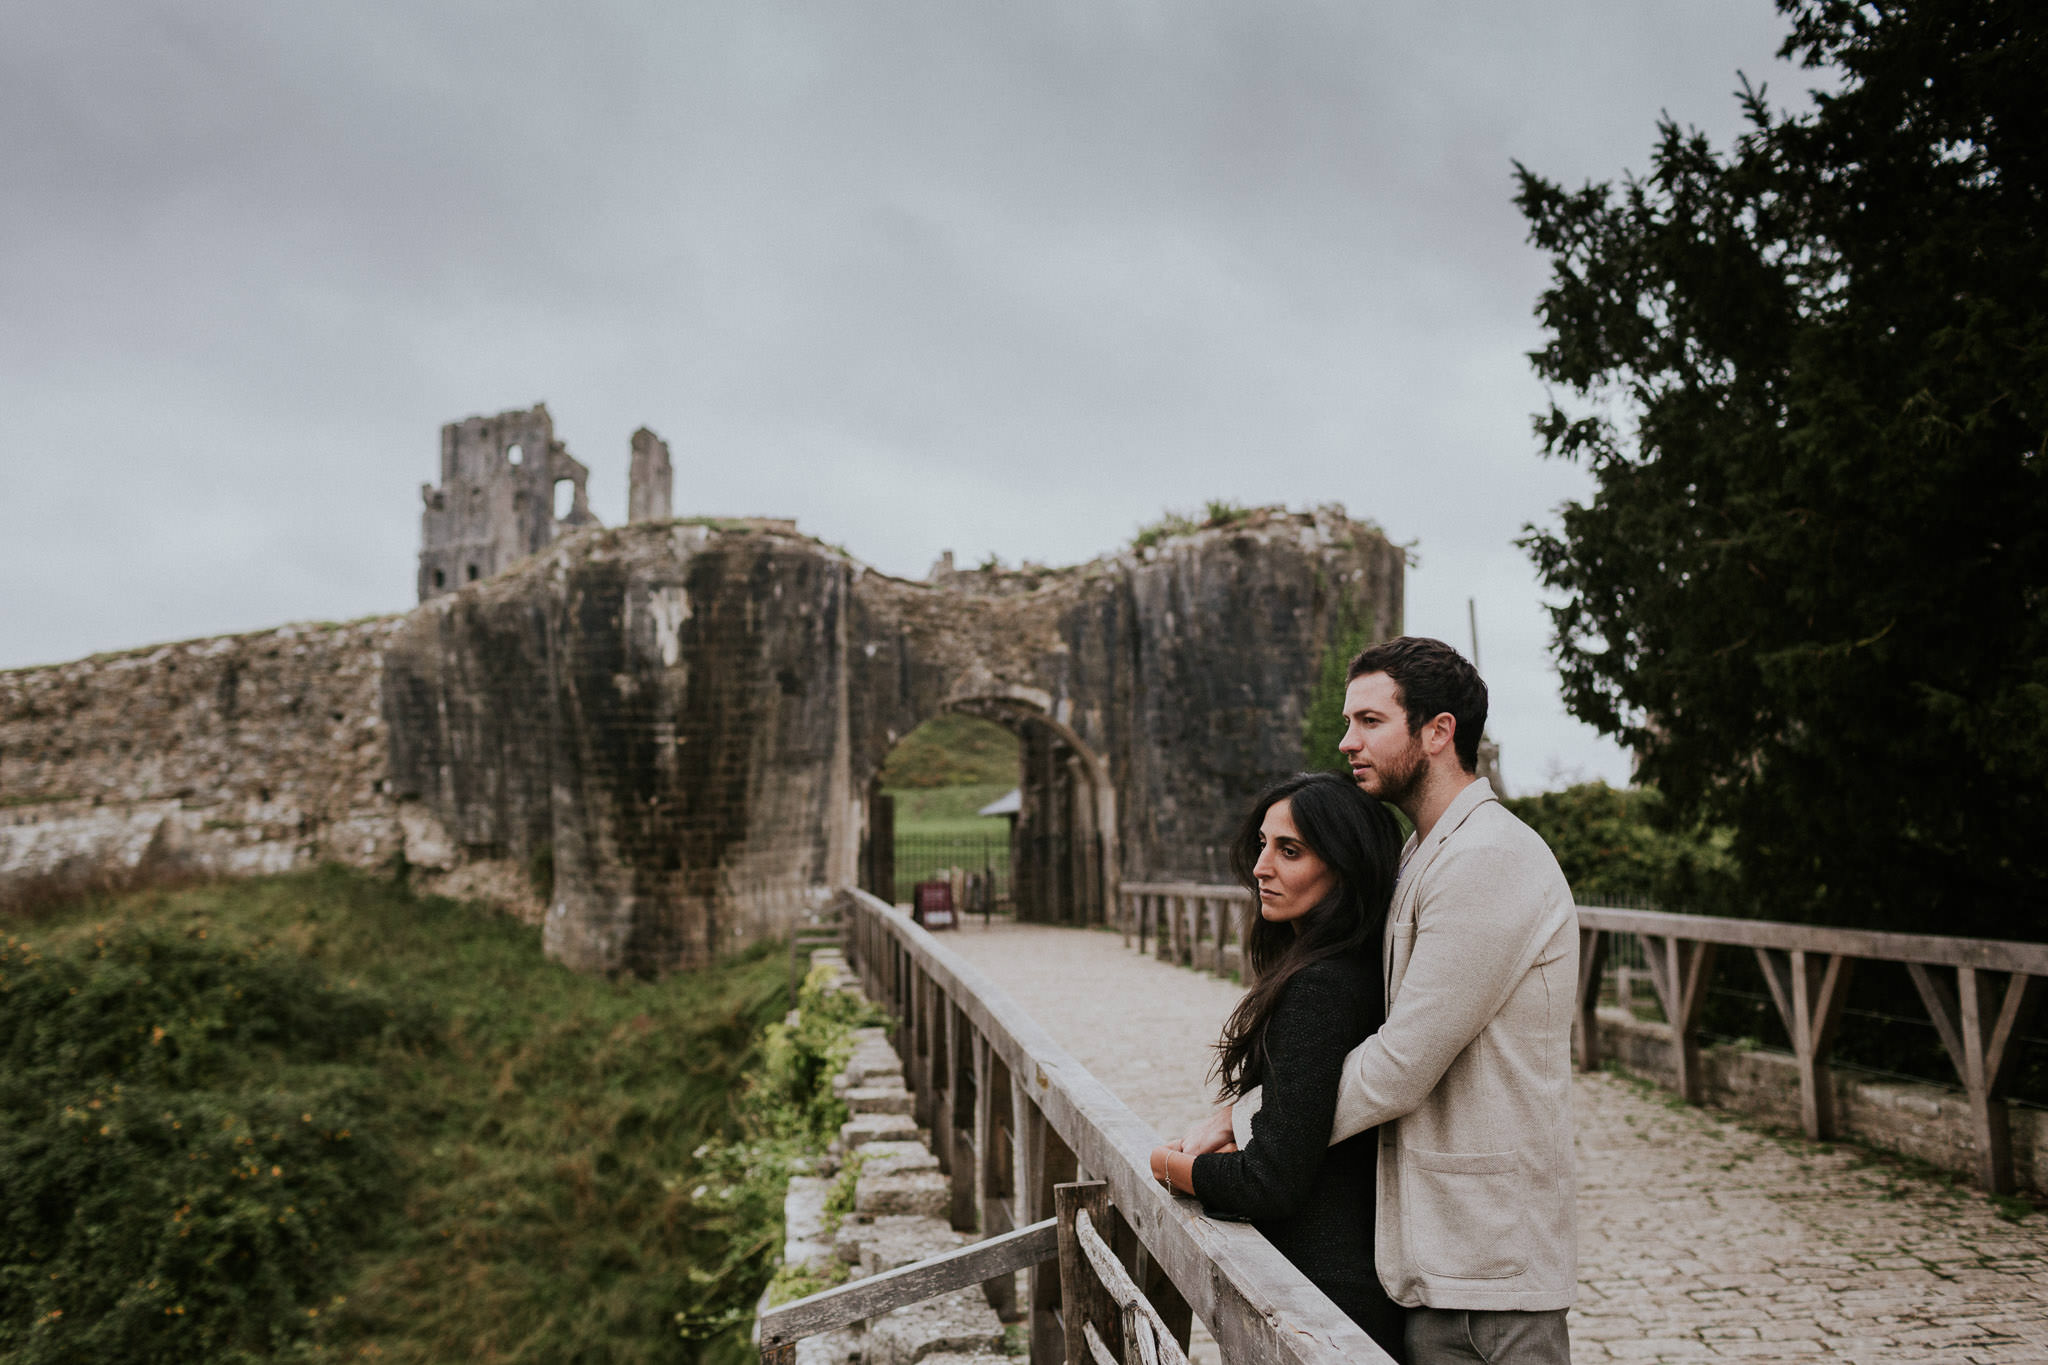 Couple embracing in Corfe castle village